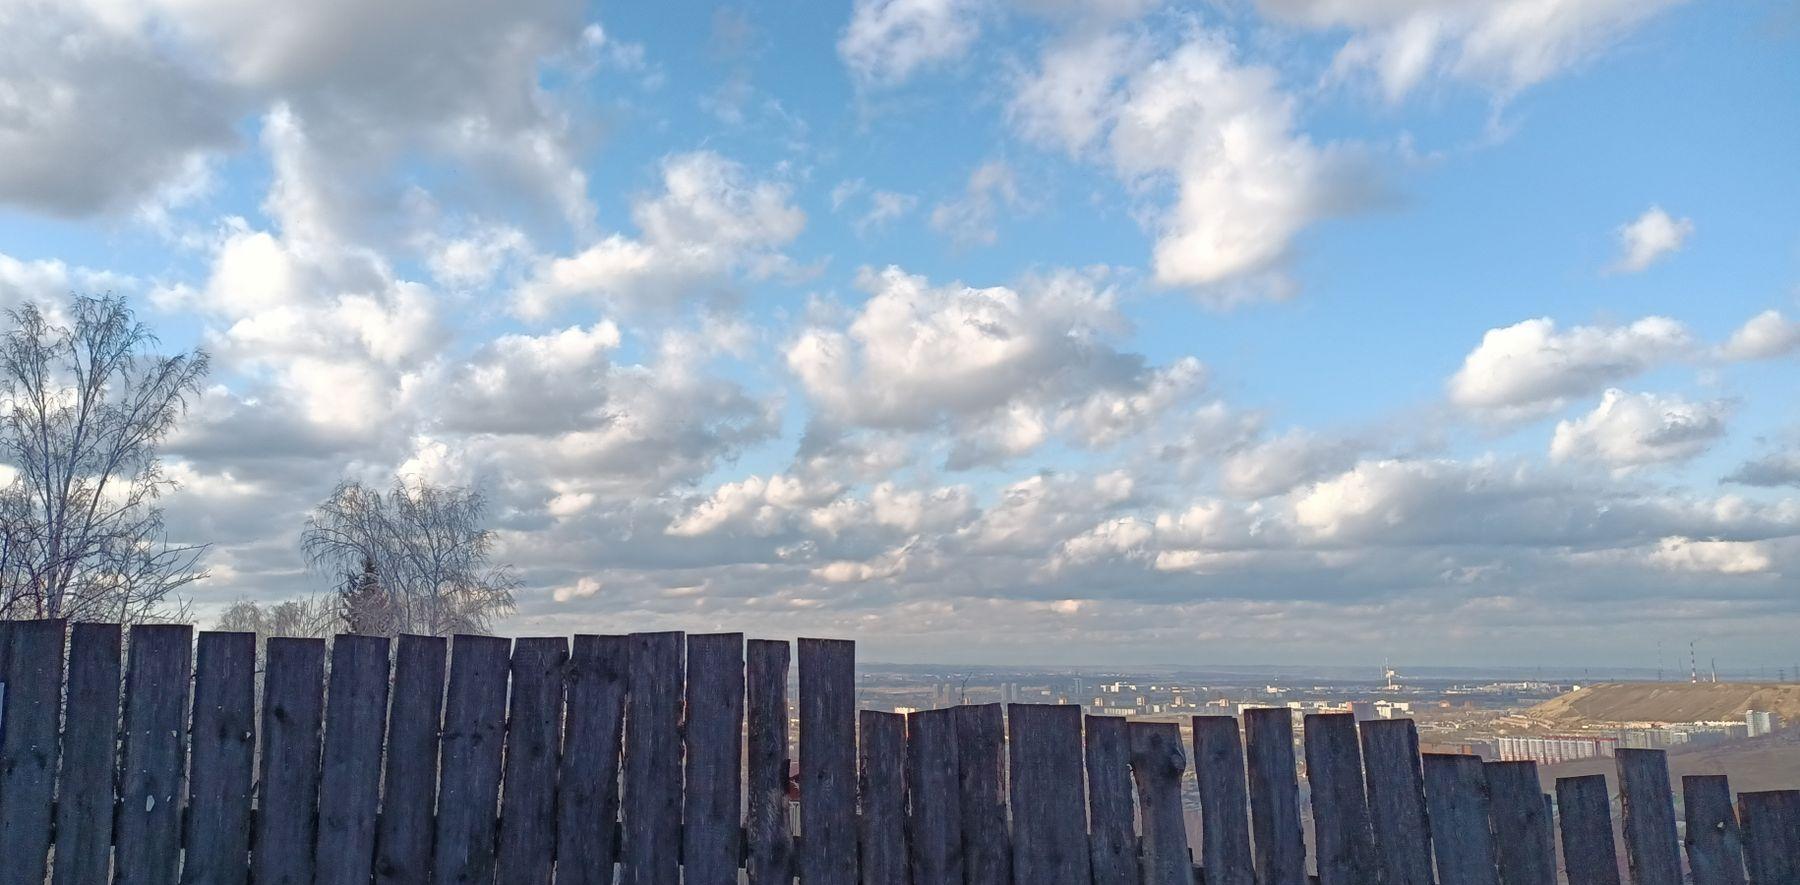 Забор*** Забор деревня весна небо облака ветви даль